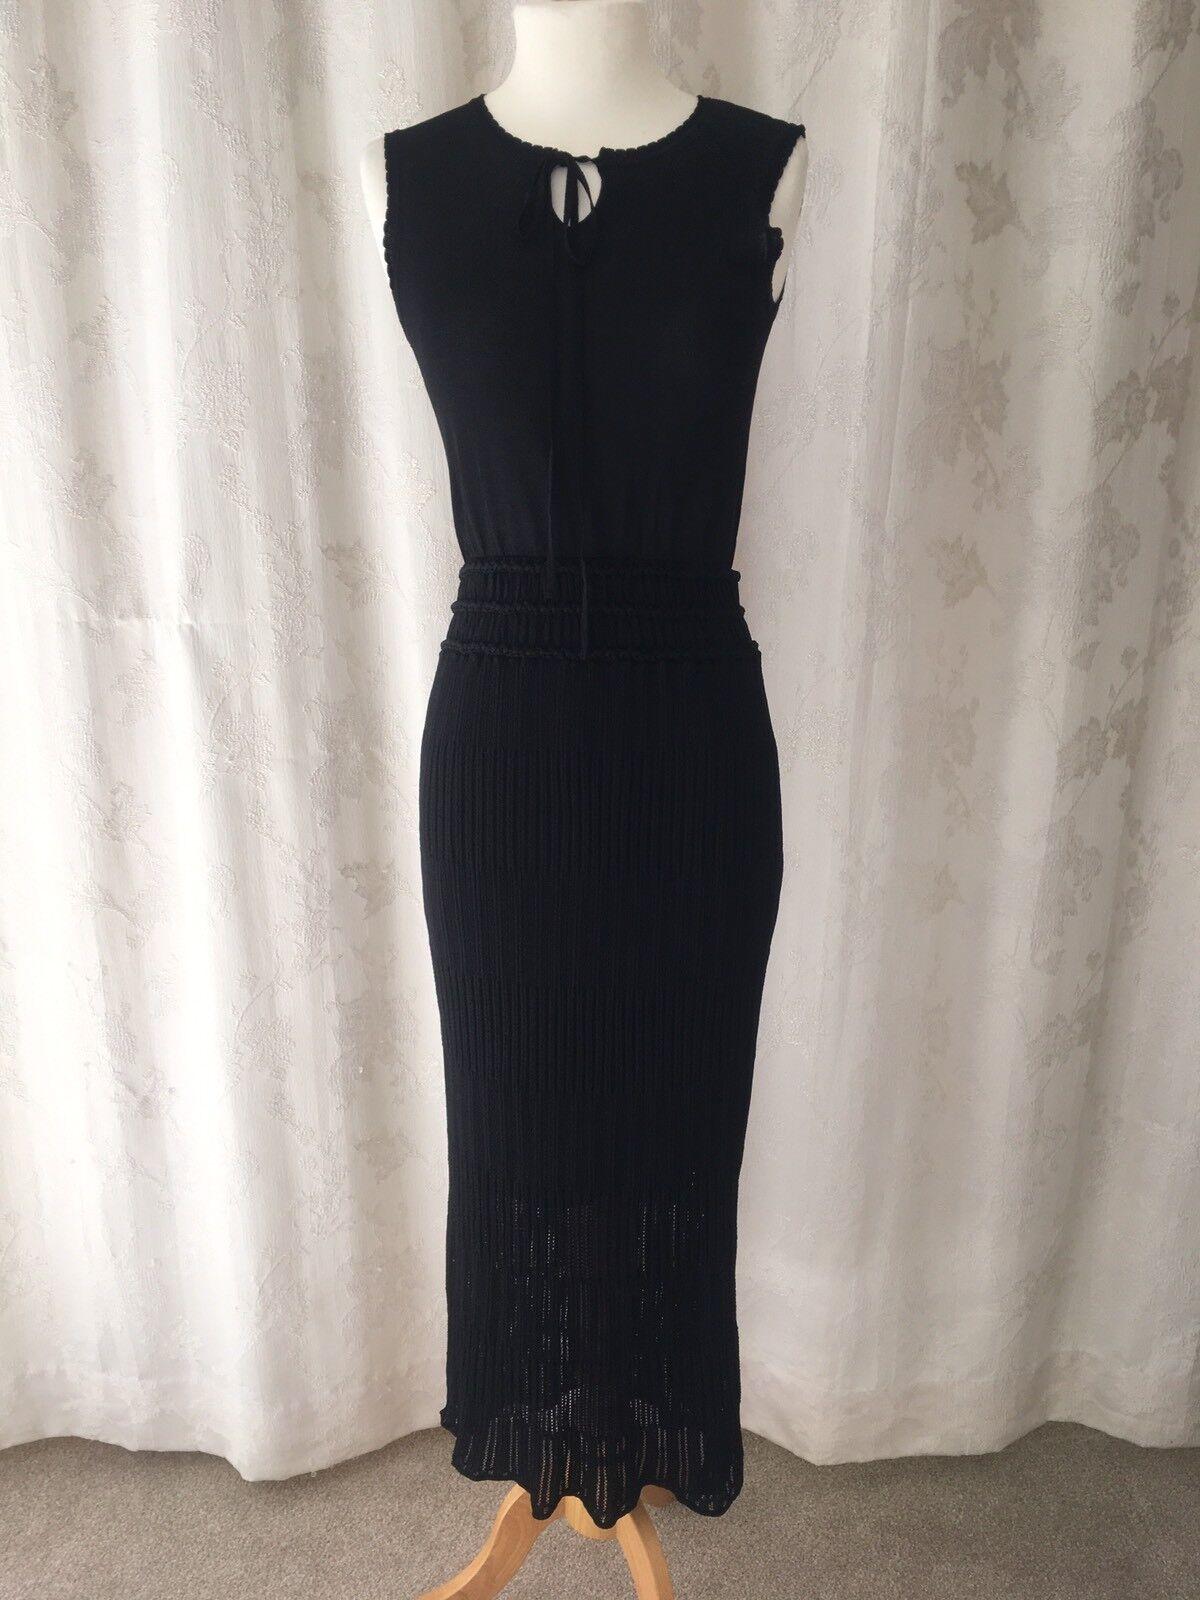 Stunning Stretch Knit Long JORYA Dress Us Size 4 U.K. Size 6